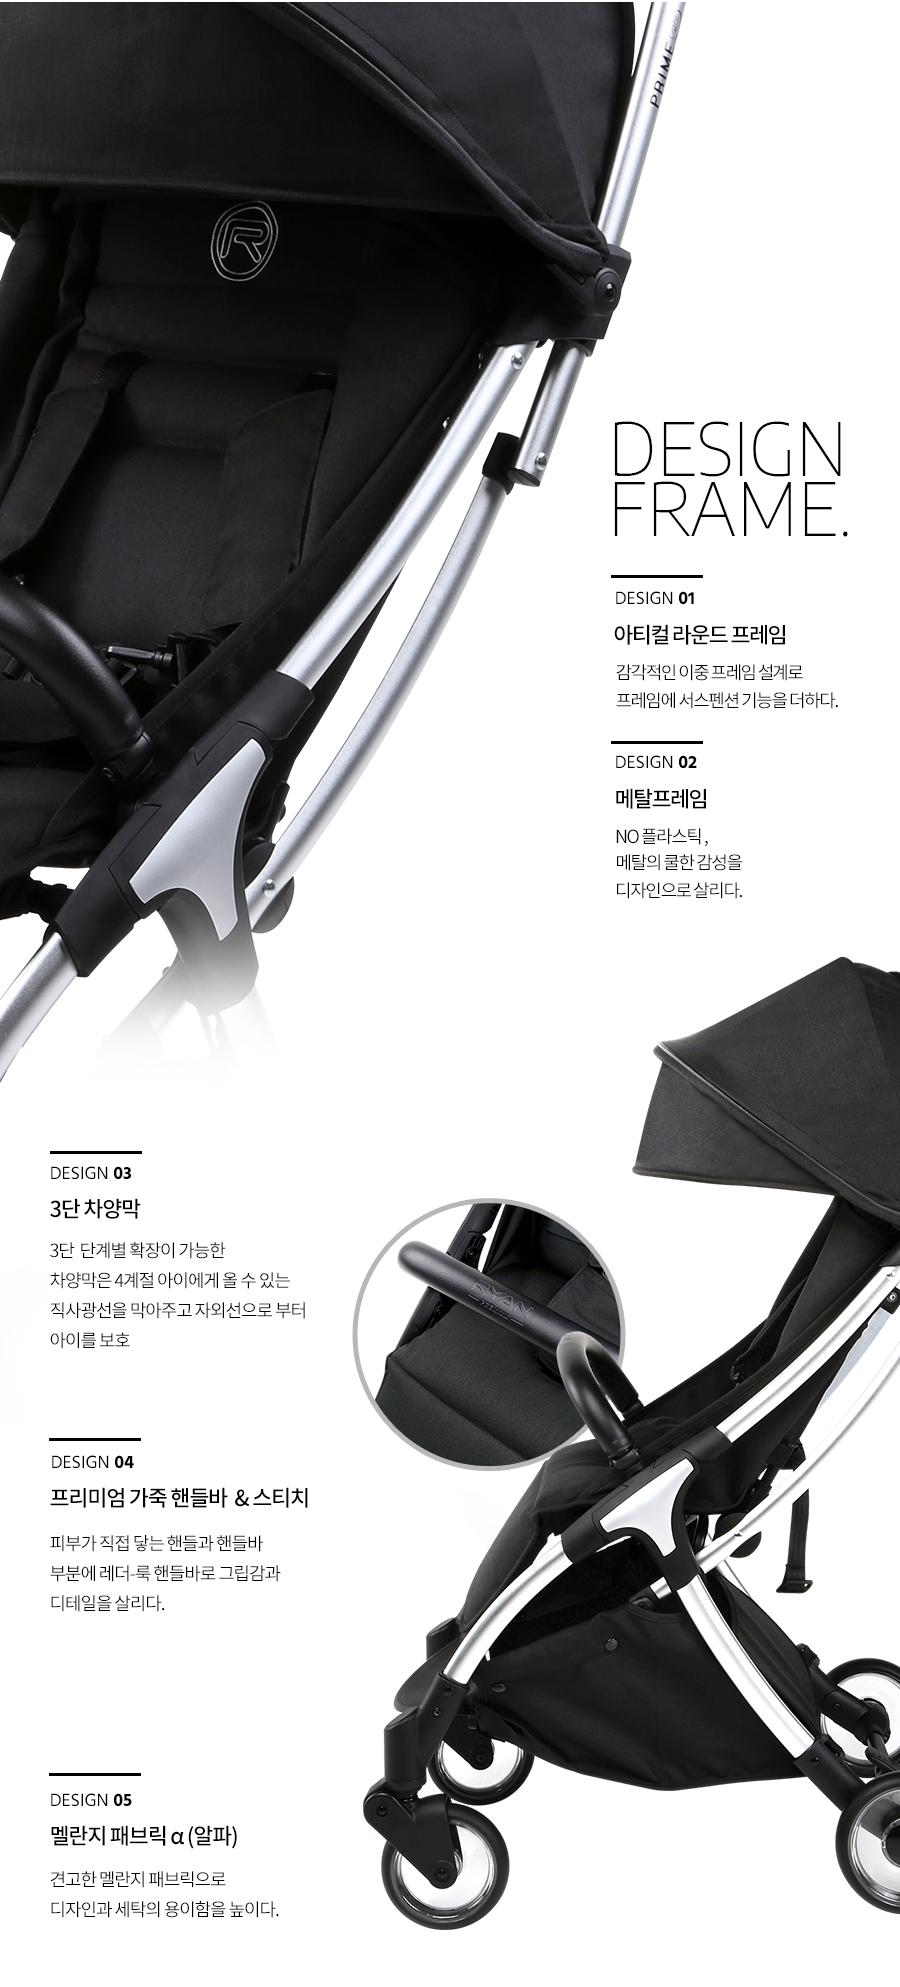 Design primelight 2019